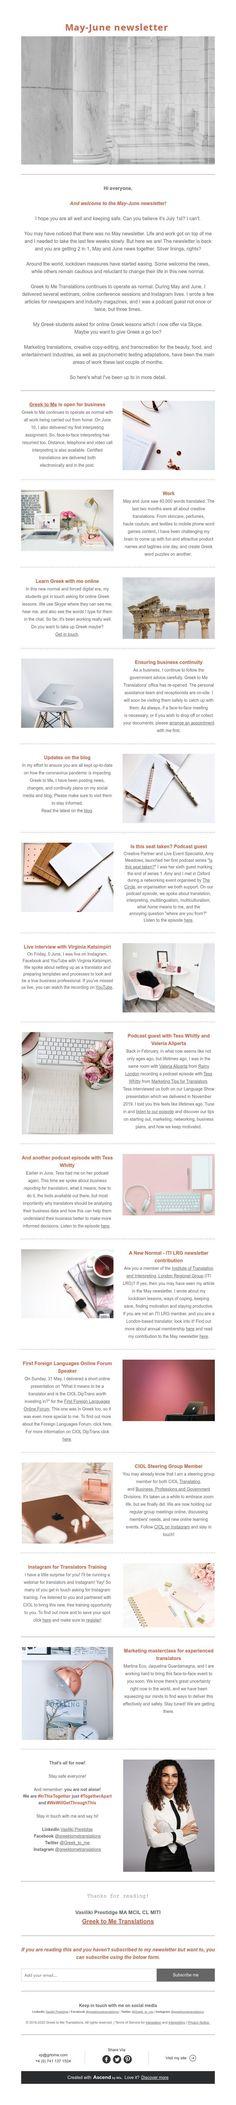 May-June newsletter Copy Editing, Instagram Life, News Blog, May, Greek, June, Greece